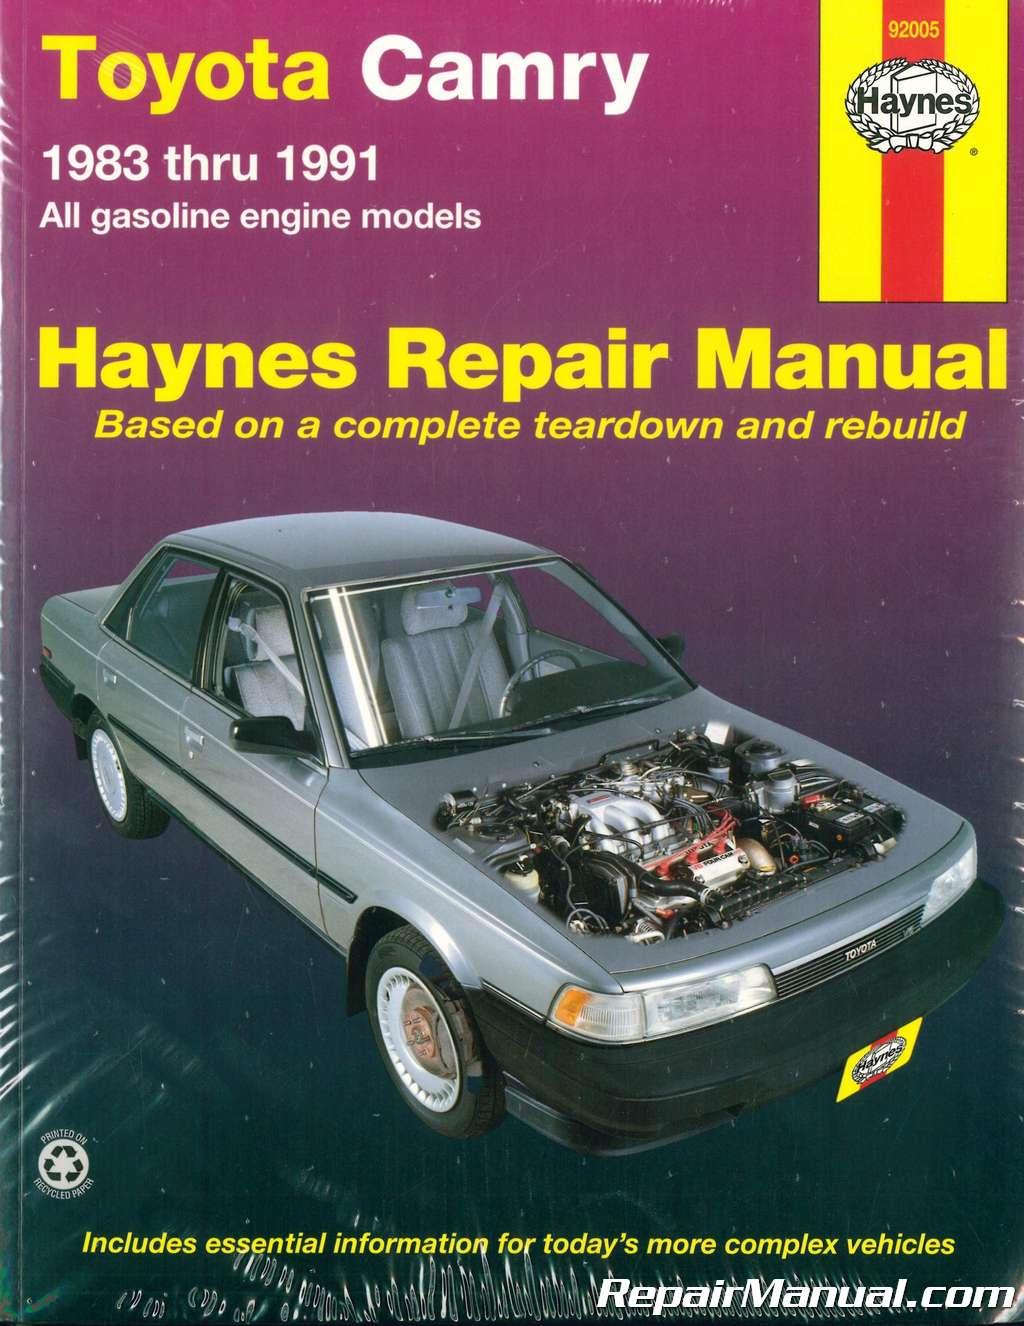 Toyota Camry Parts Catalog Auto Parts Diagrams